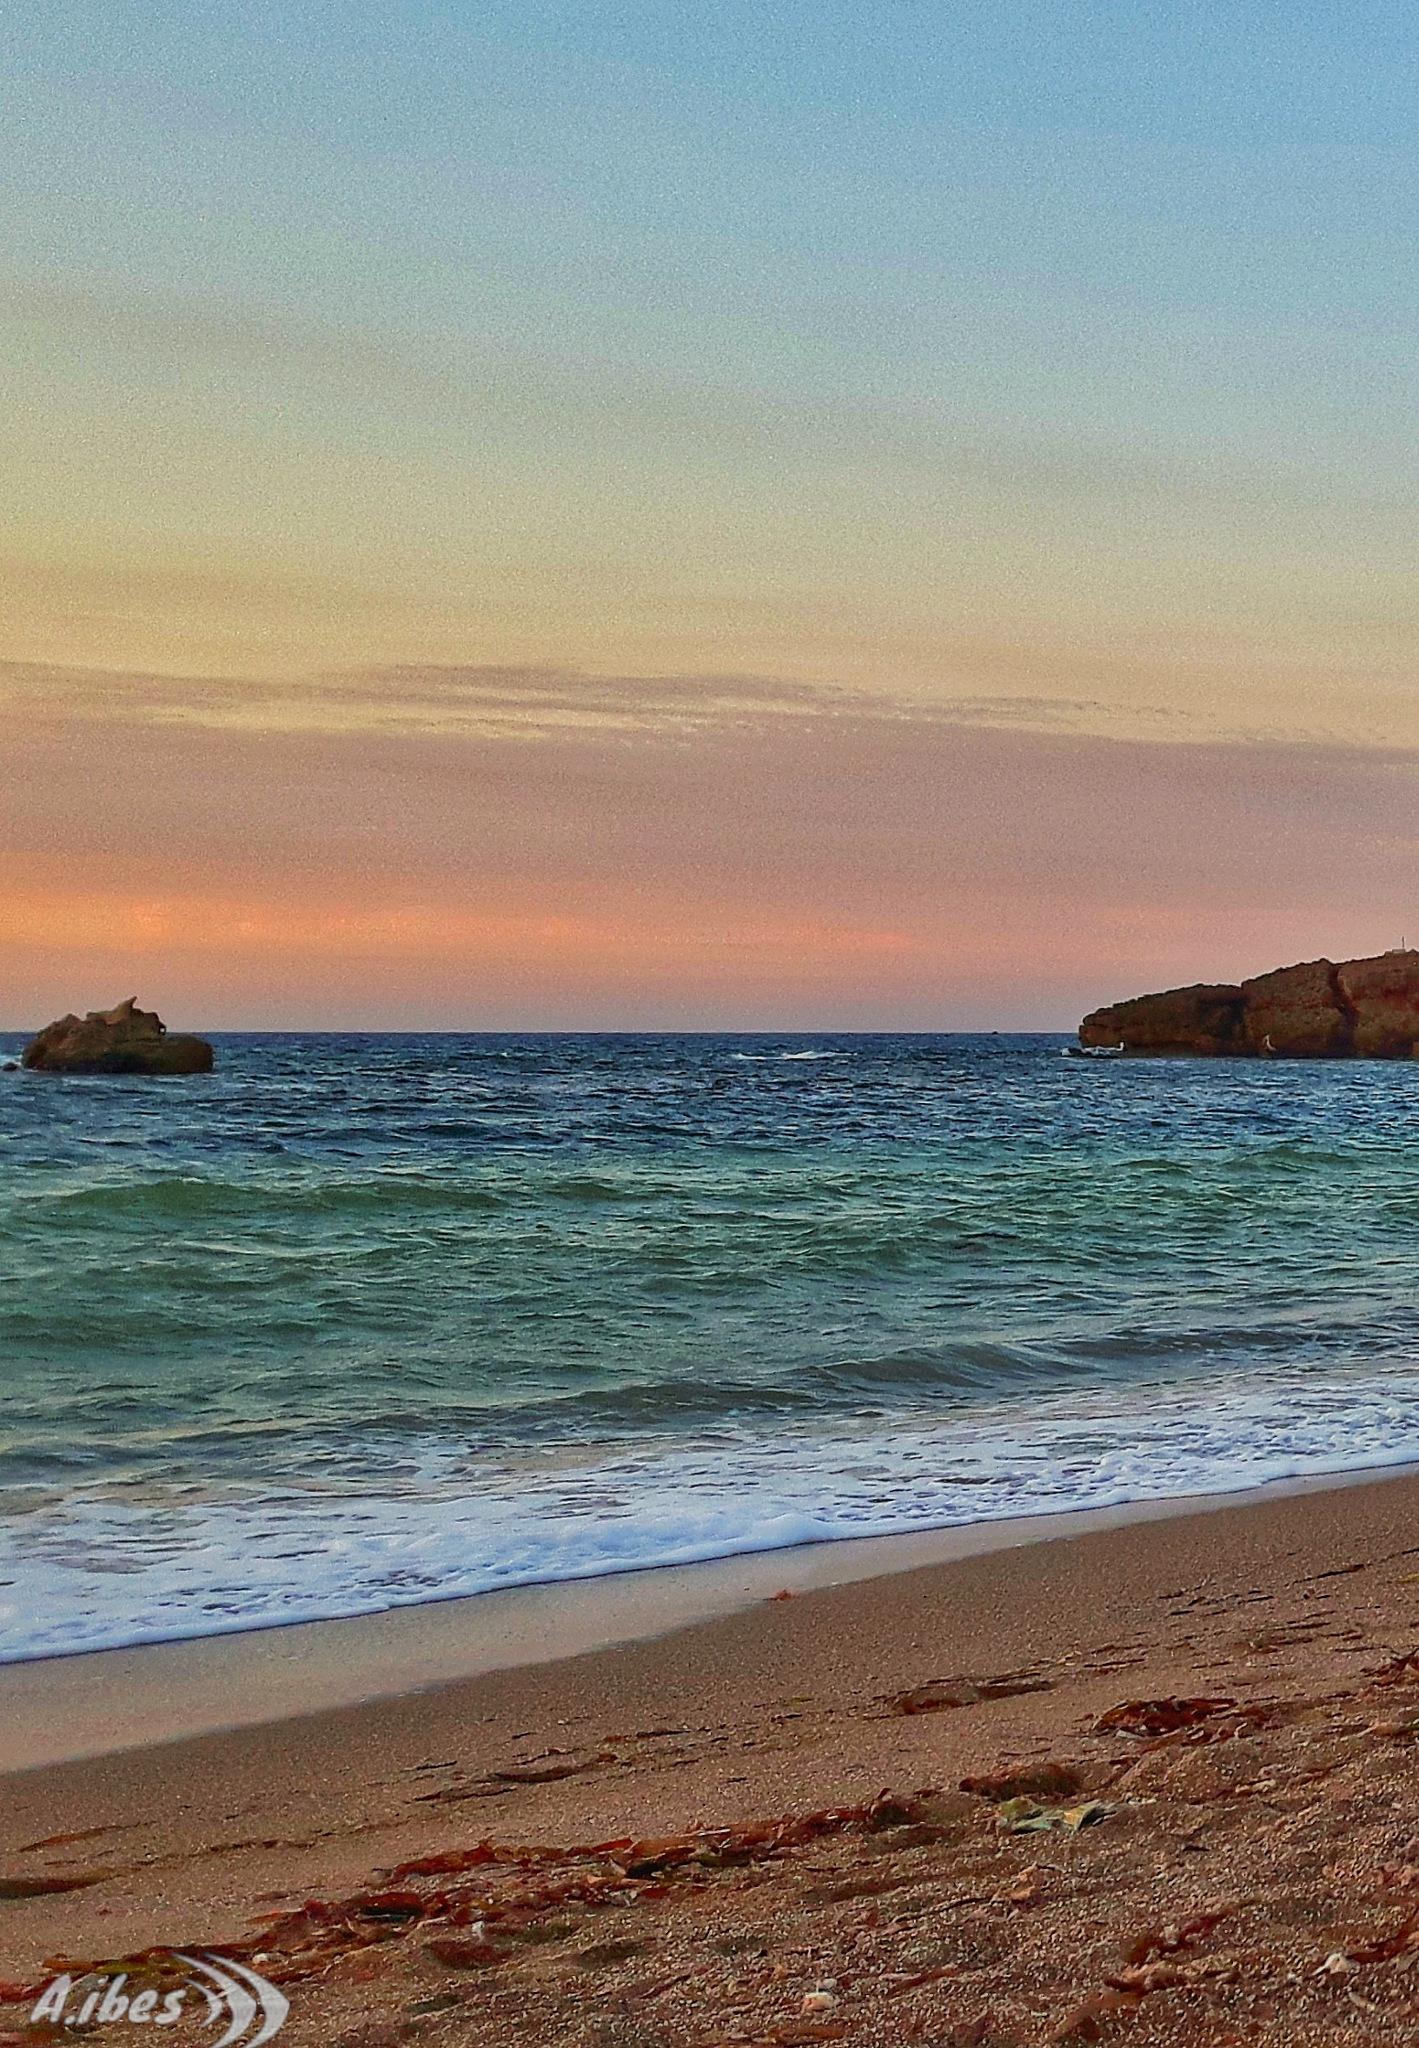 #sunset #beach #playa #plage  by Ali Ibes